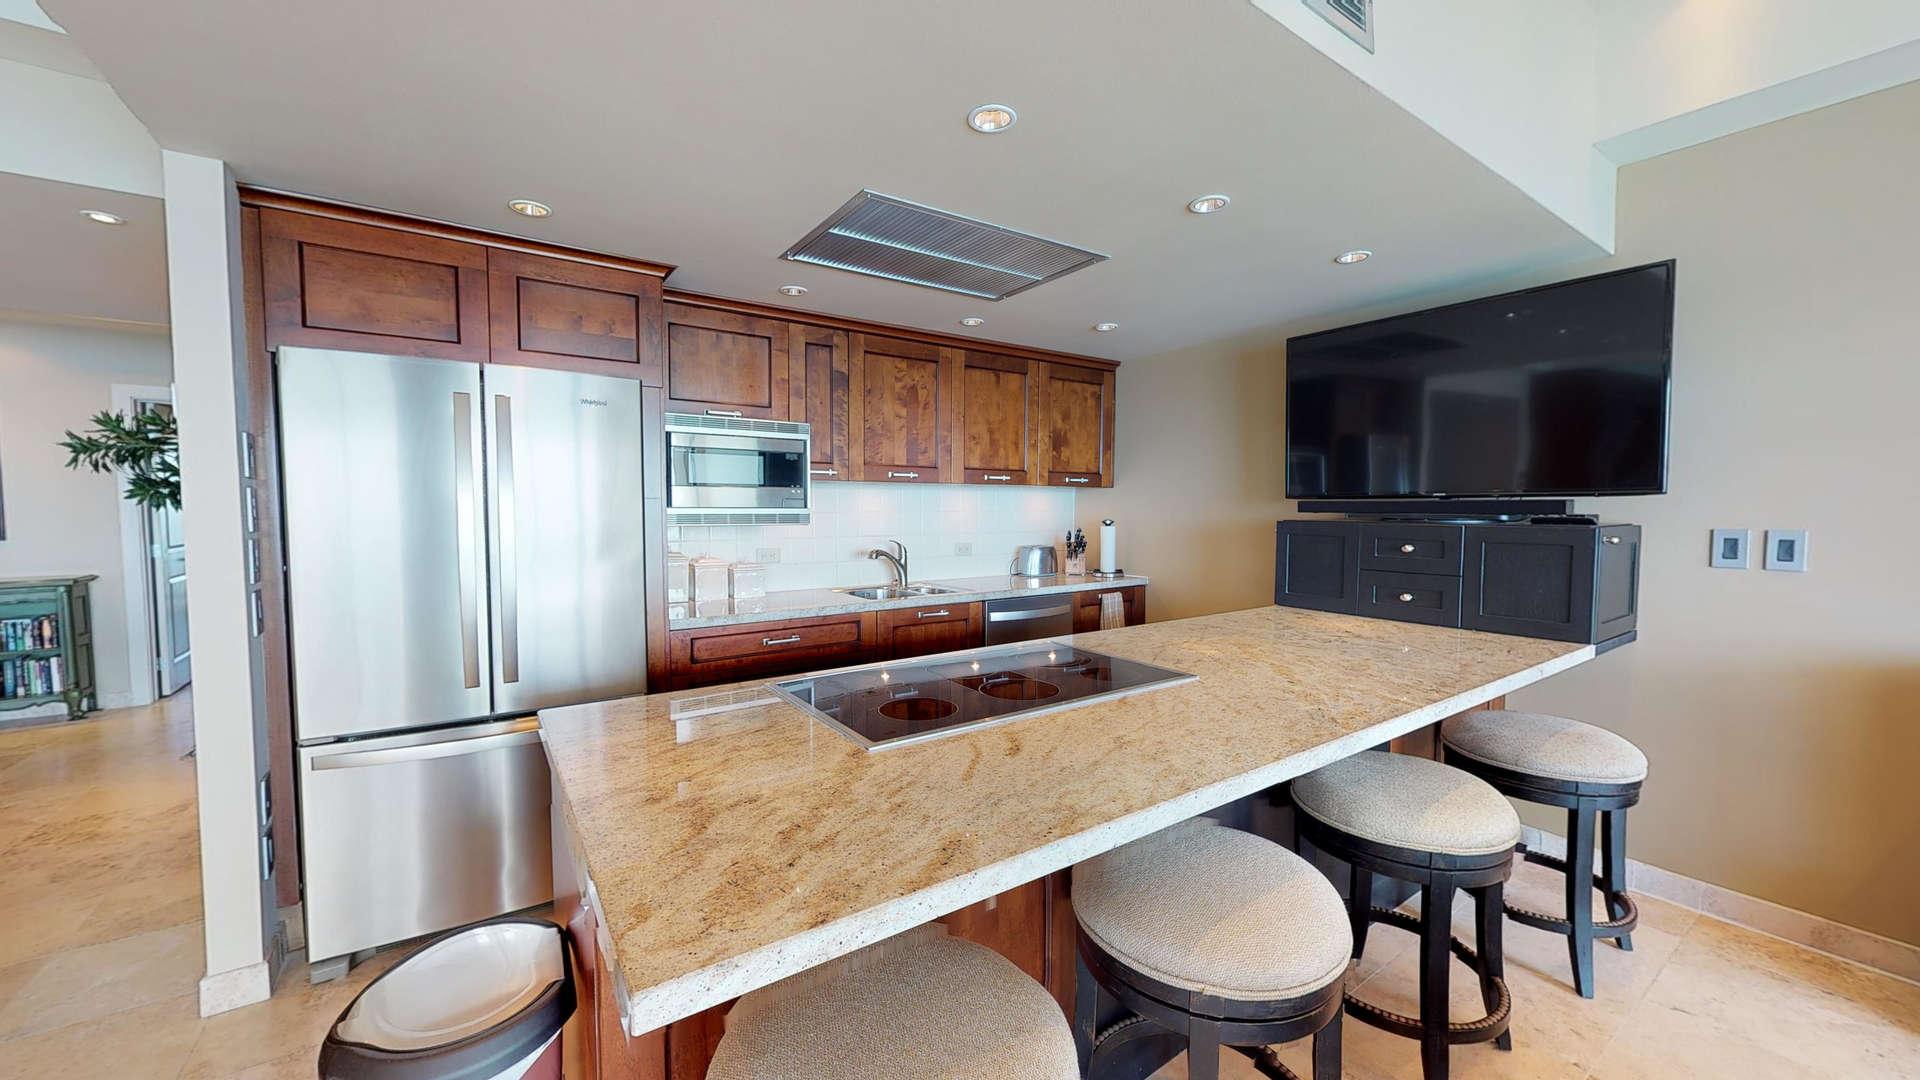 Luxury villa rentals caribbean - St martin - Sint maarten - Cupecoy - Sunsational - Image 1/20